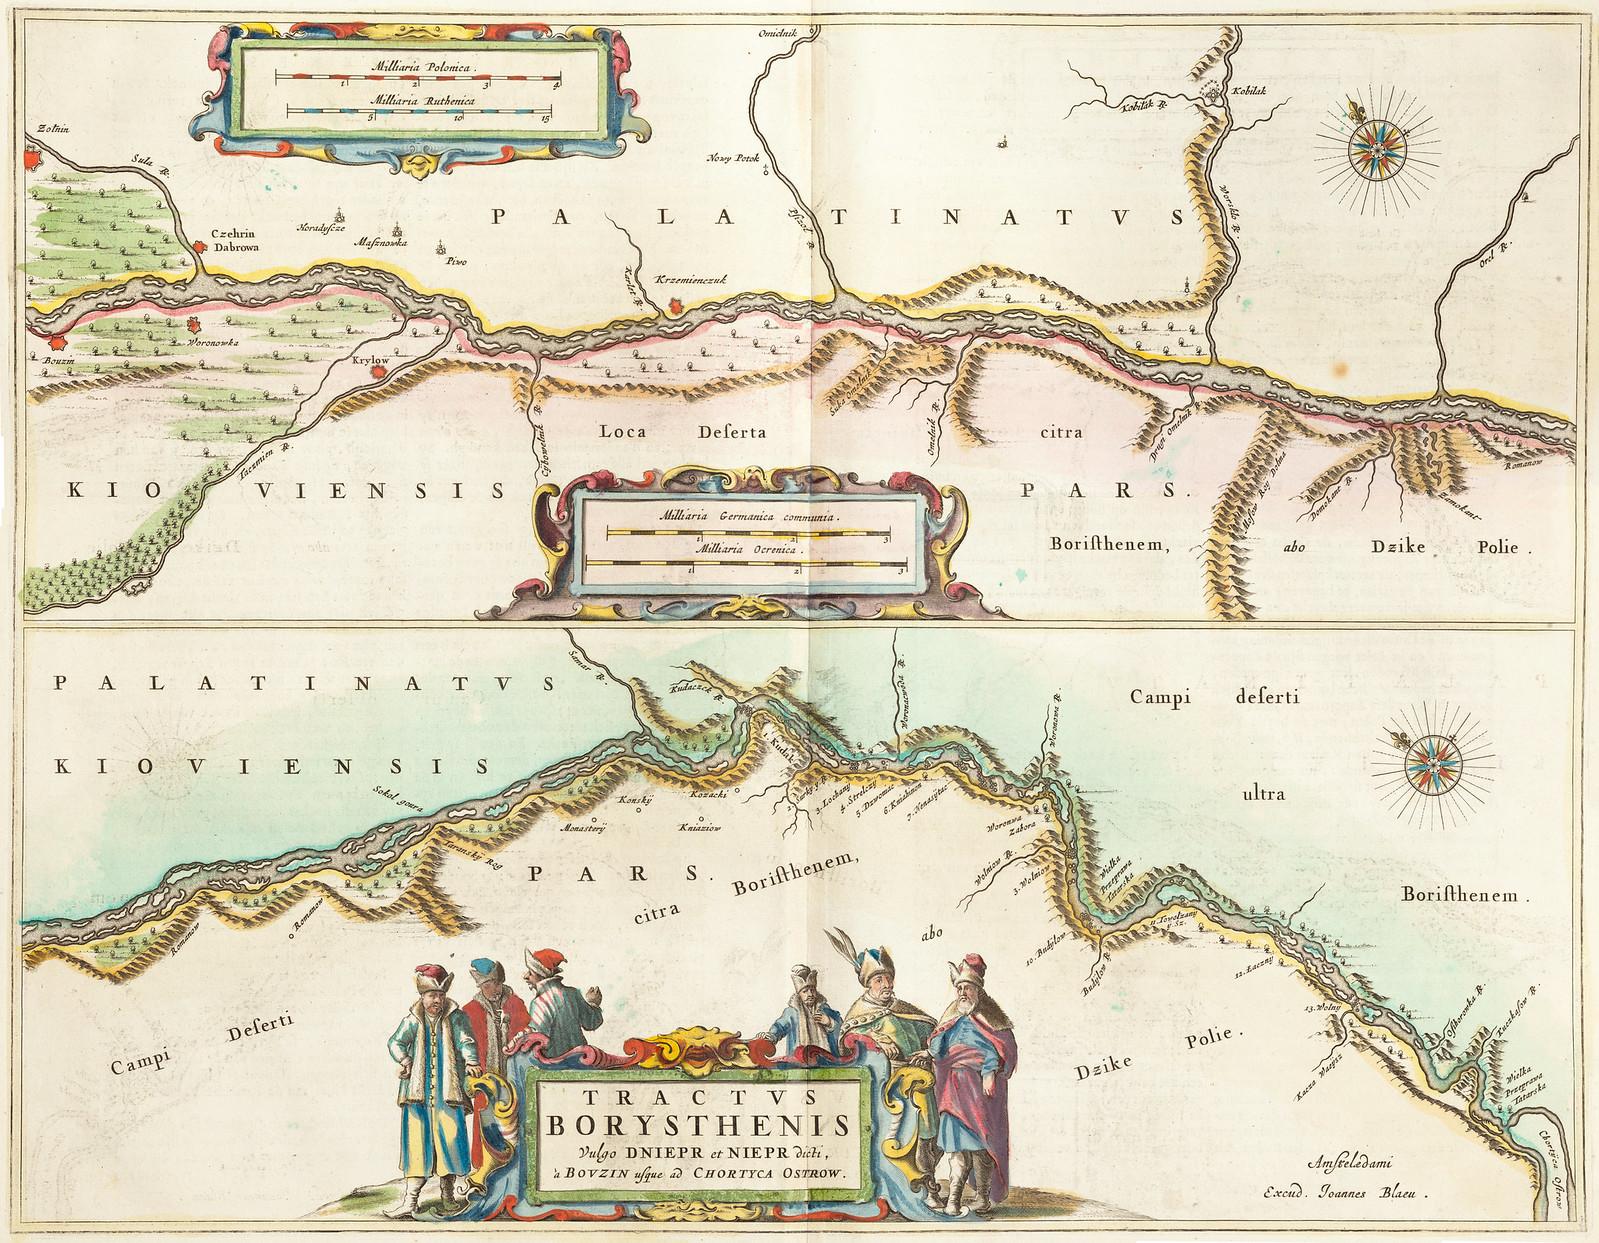 Tractus Borysthenis 1662 (2)